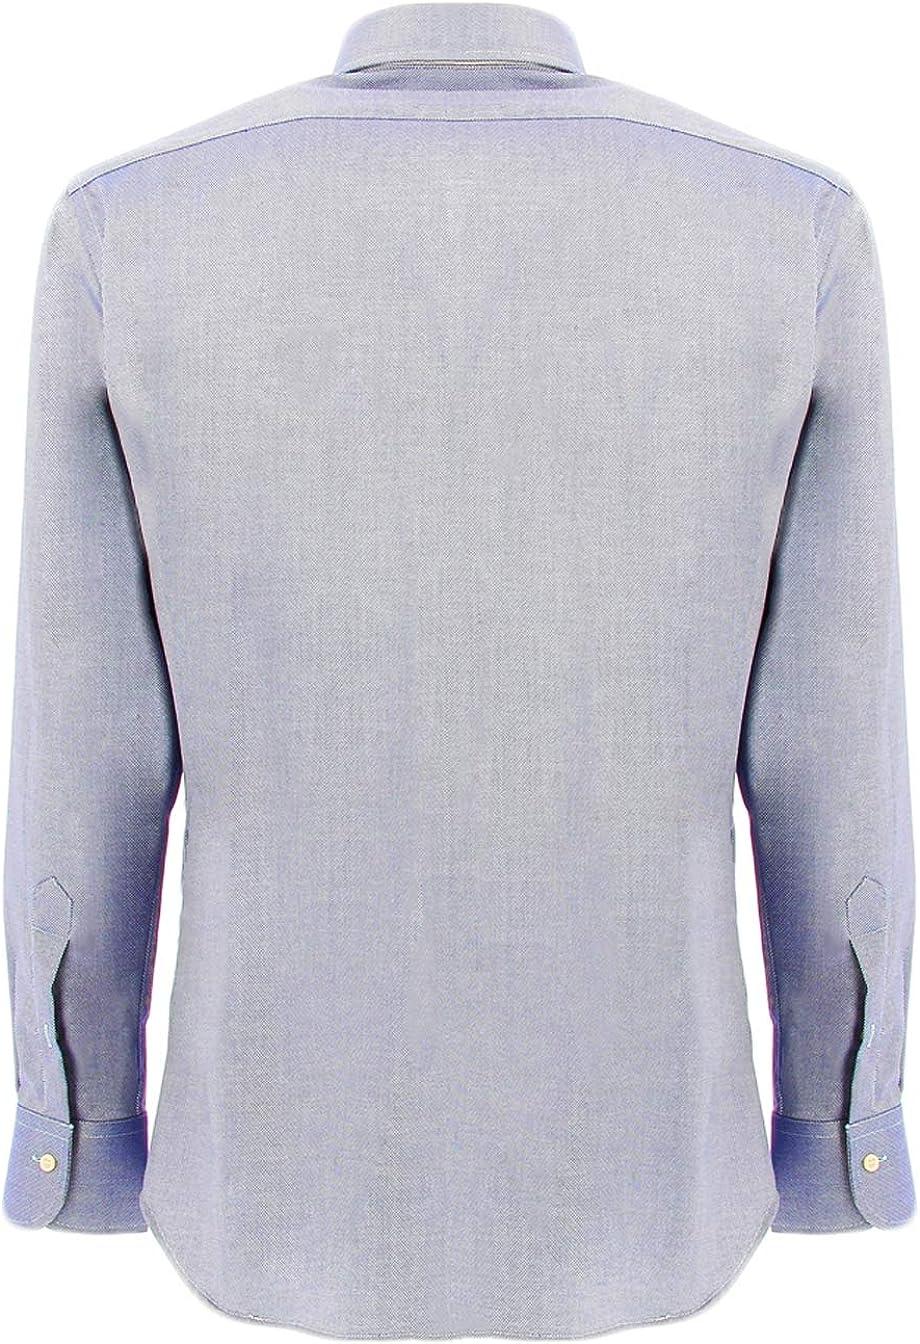 Ingram cottonstir Operated Shirt for Men